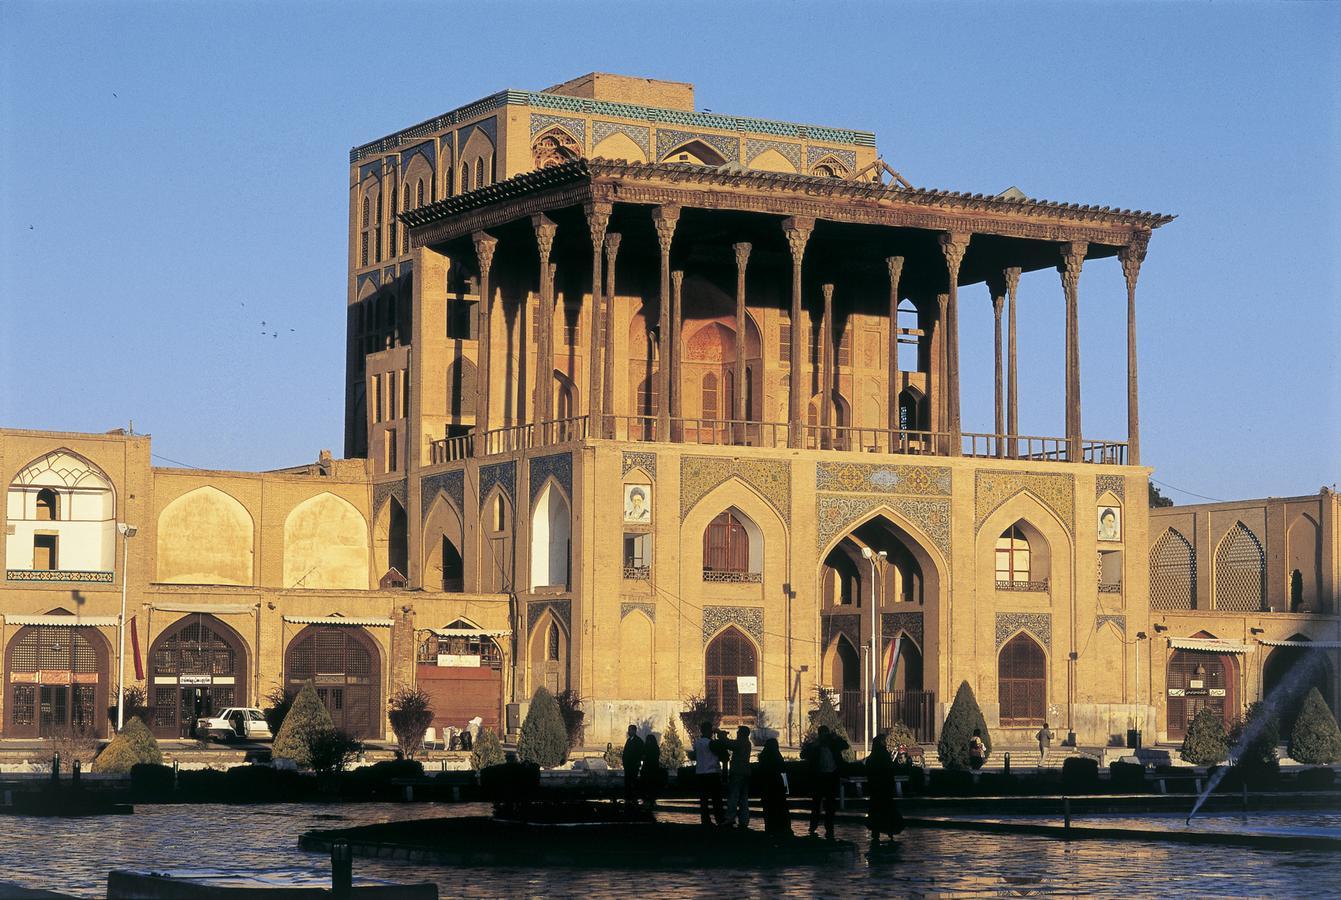 17dAli-Qapu-paladset_-Isfahan_-Iran.-JA.jpg